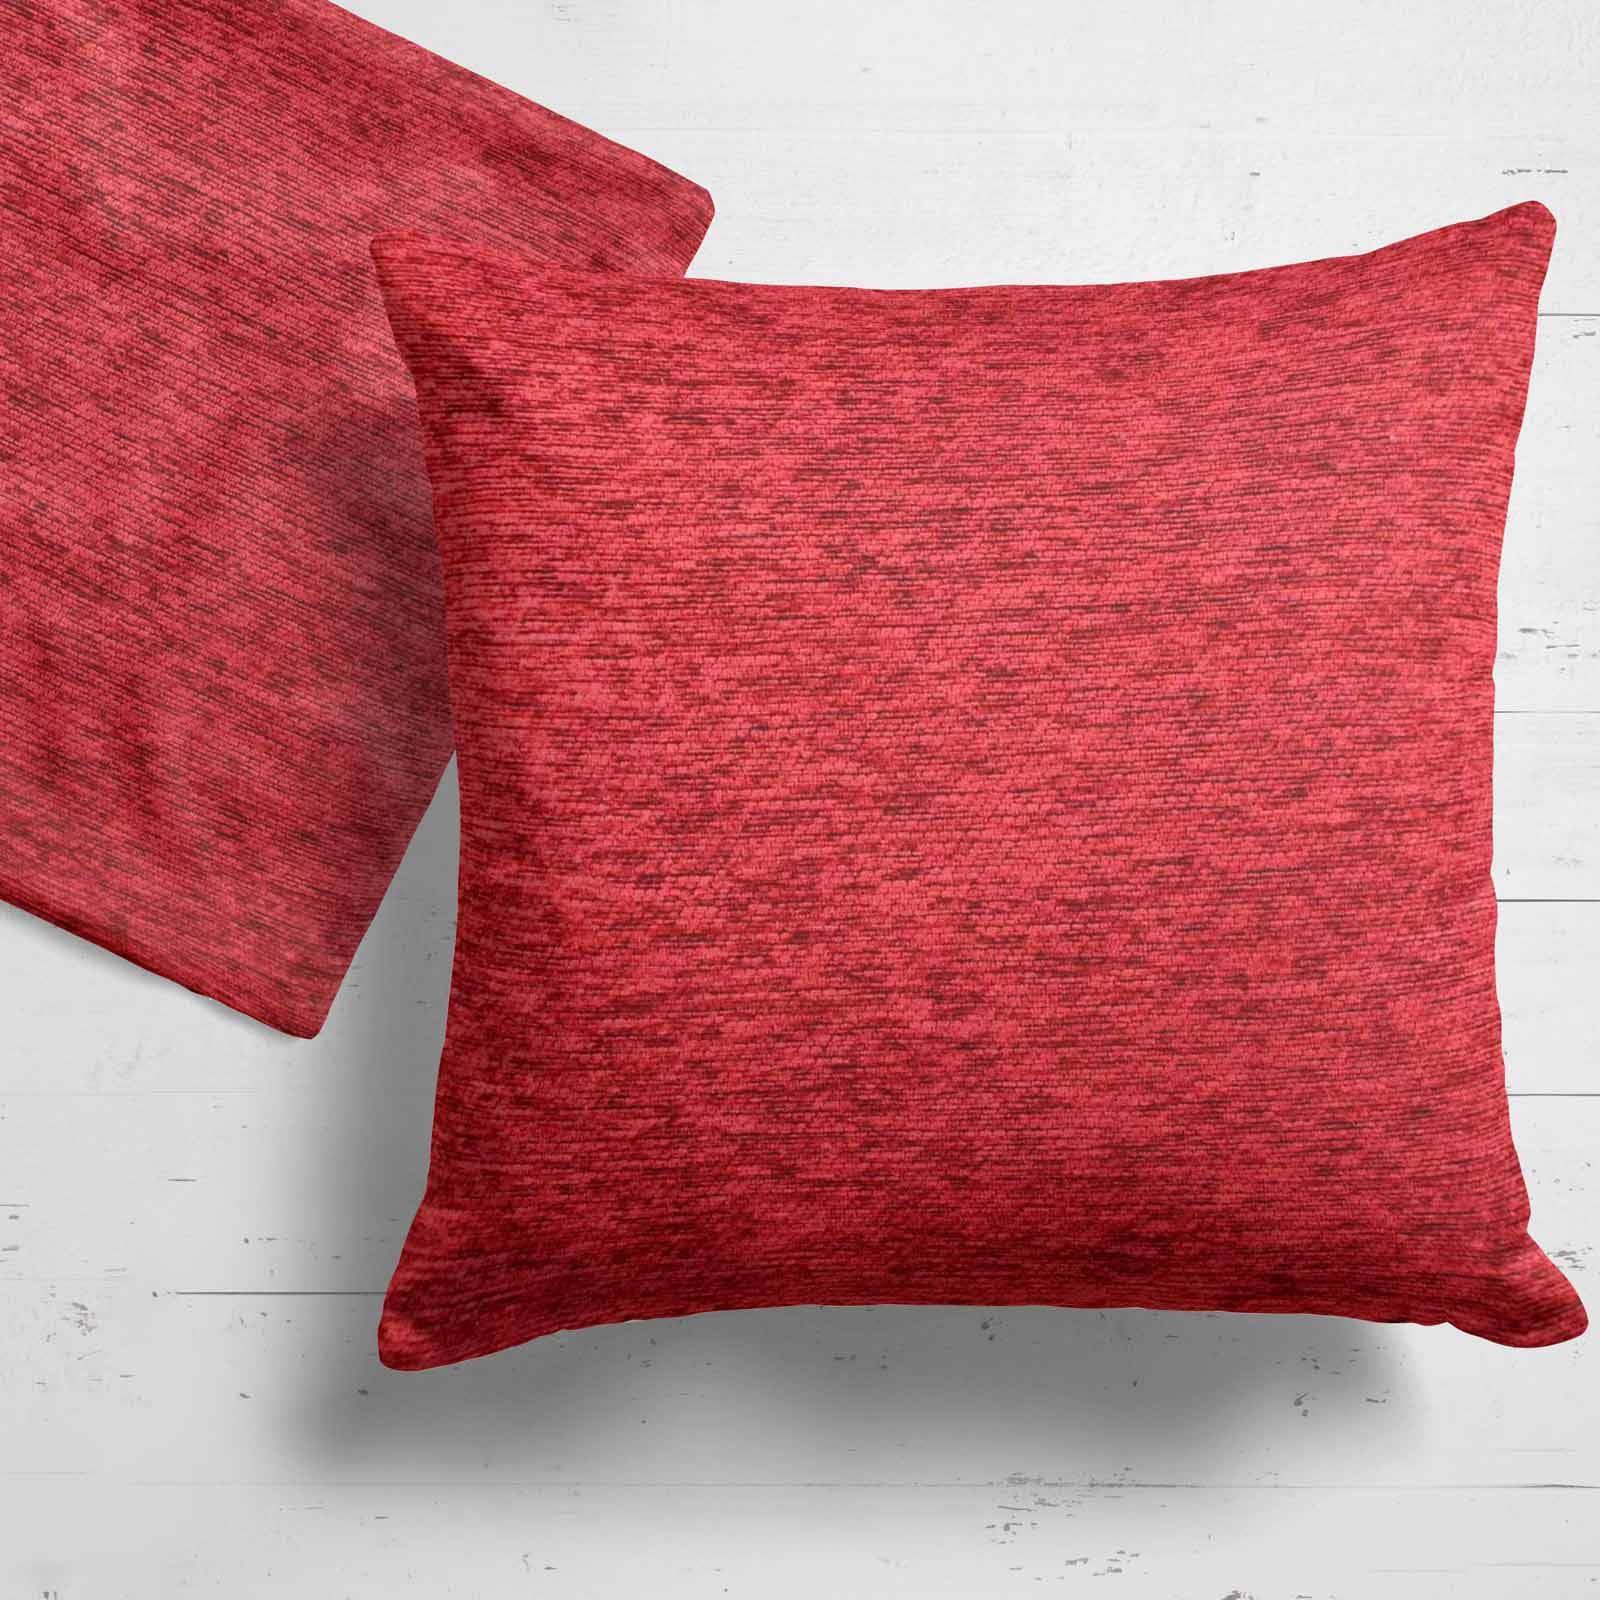 Set-of-2-Chenille-Cushion-Covers-Luxury-Plain-Cushions-Cover-Pairs-18-034-x-18-034 thumbnail 21